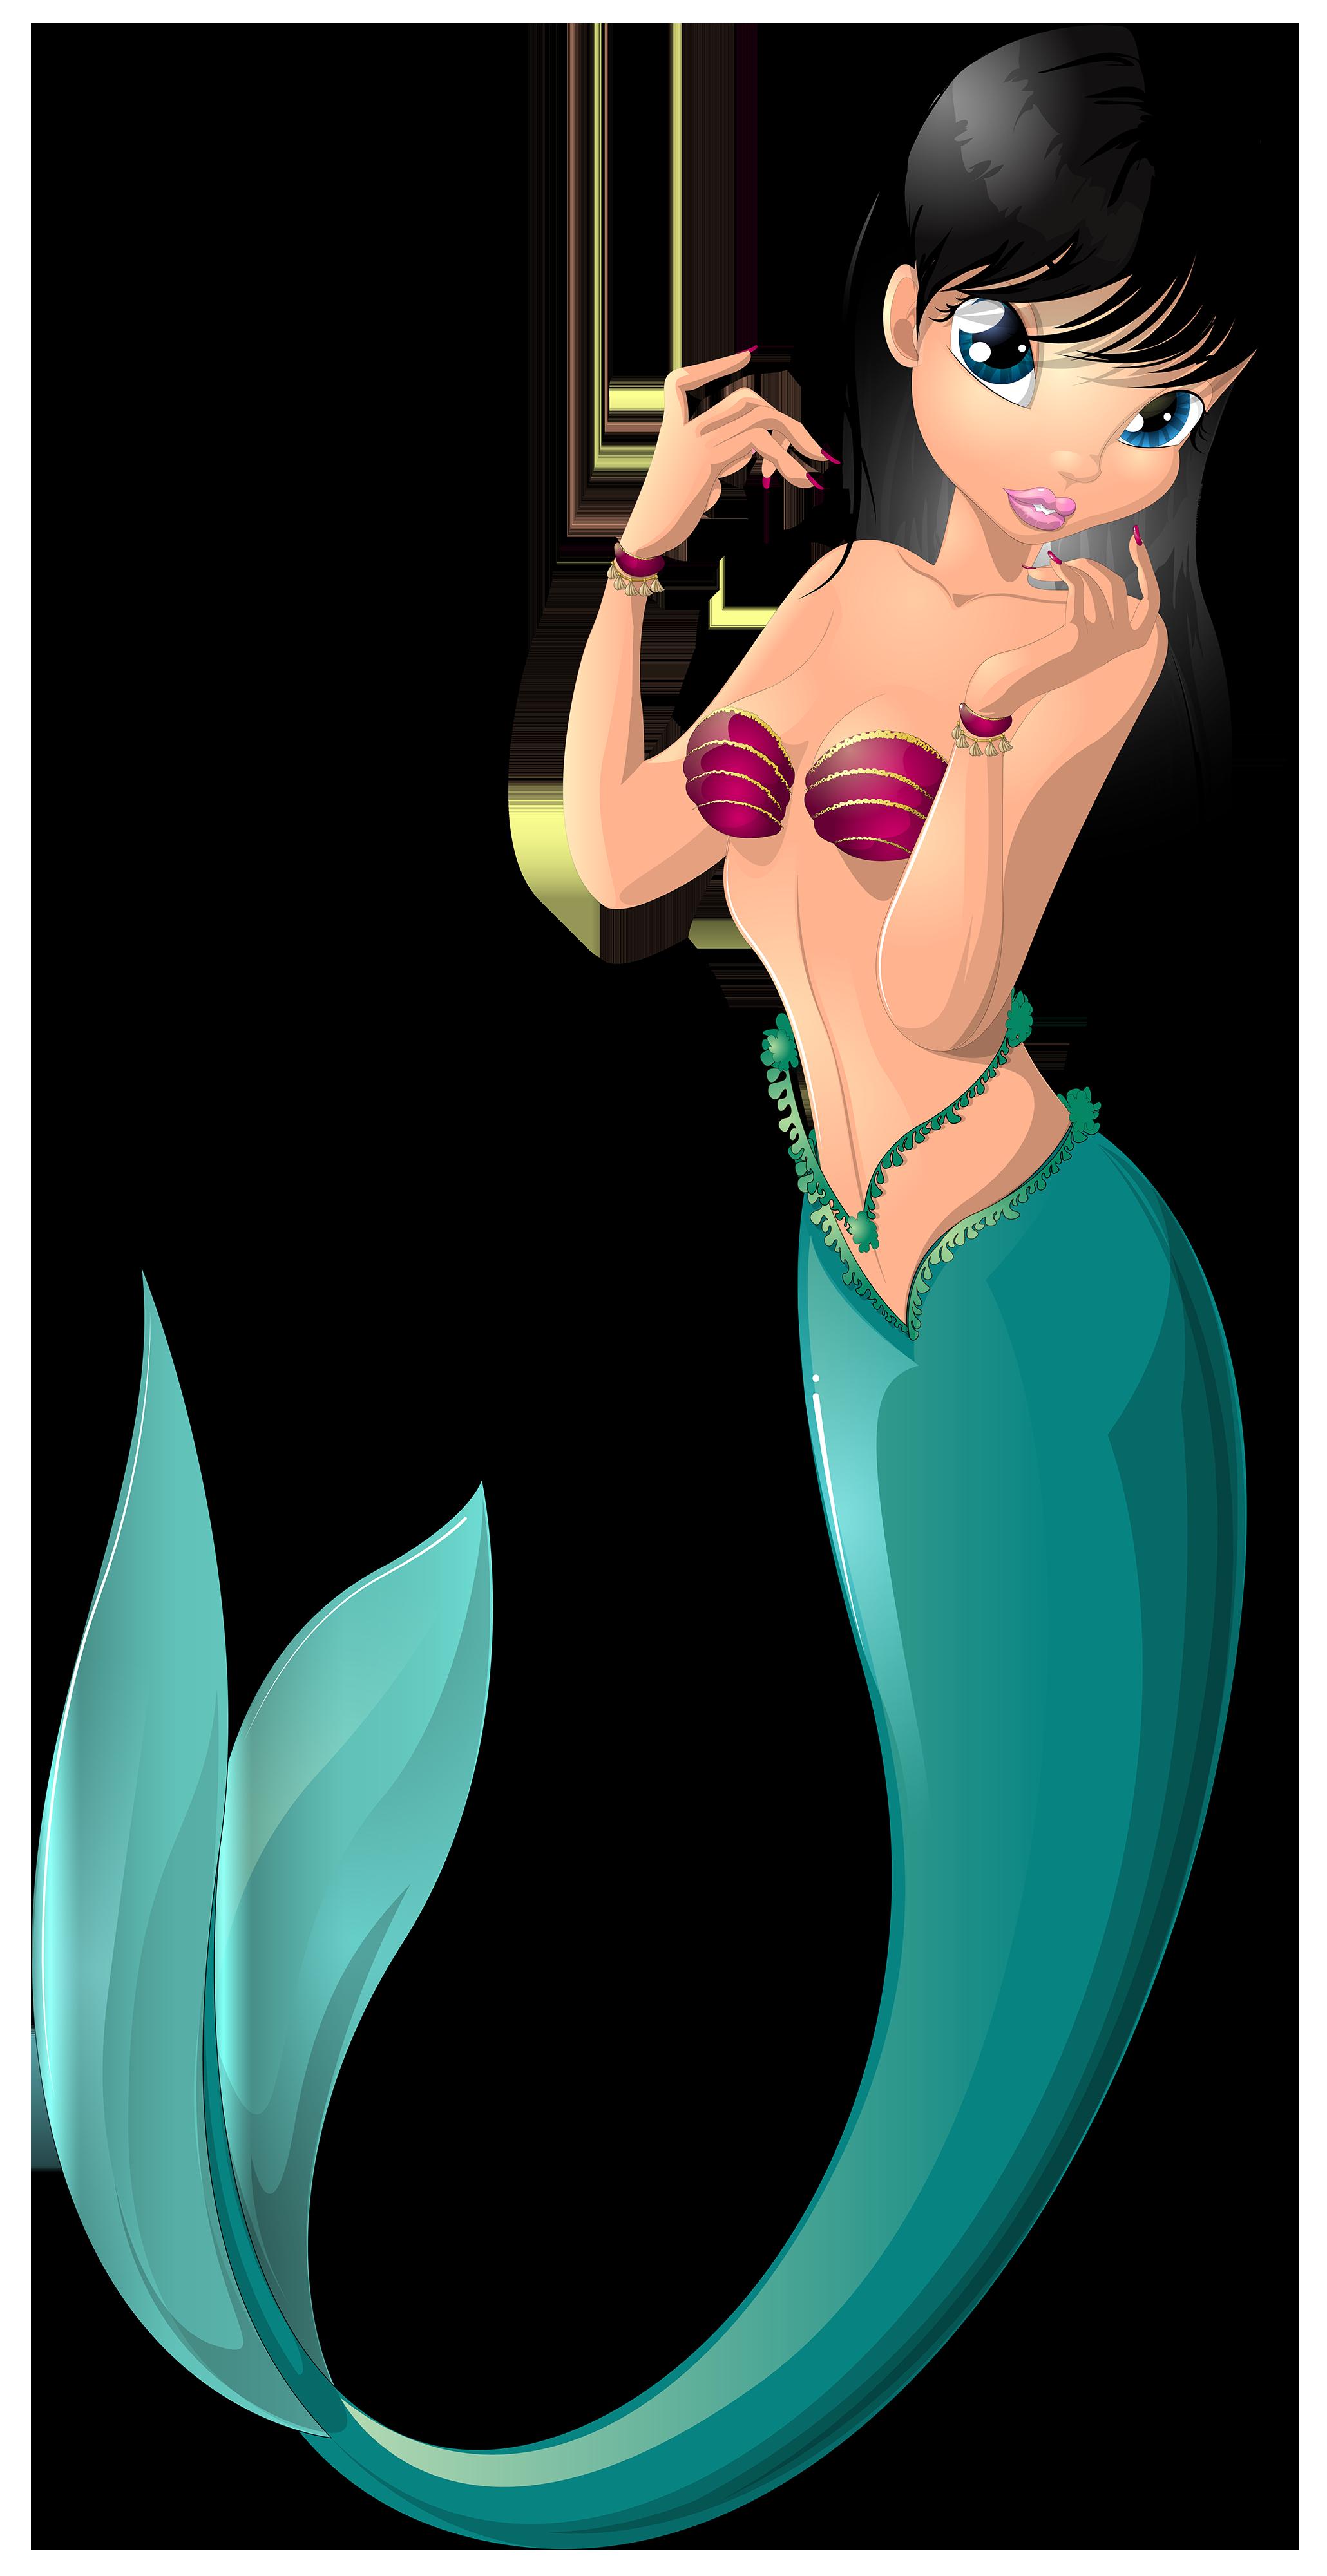 2060x4000 Mermaid Png Clip Art Imageu200b Gallery Yopriceville